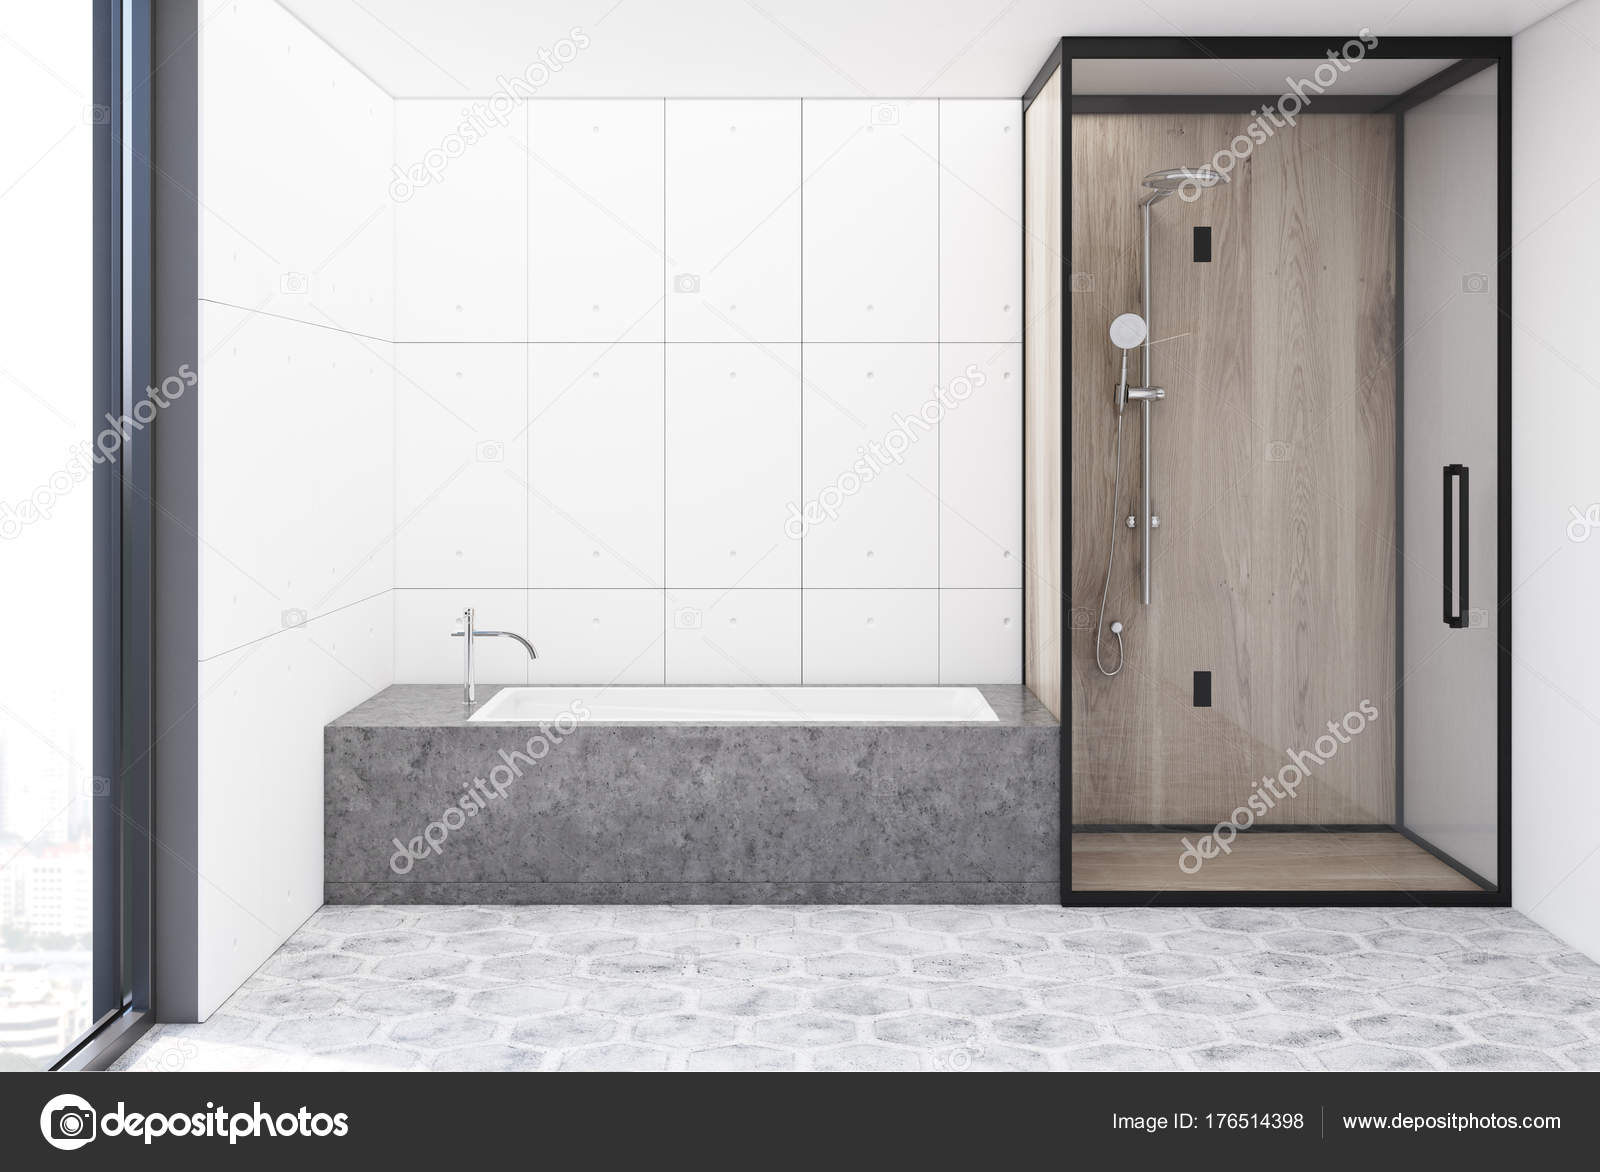 Bianco piastrelle bagno interni u foto stock denisismagilov